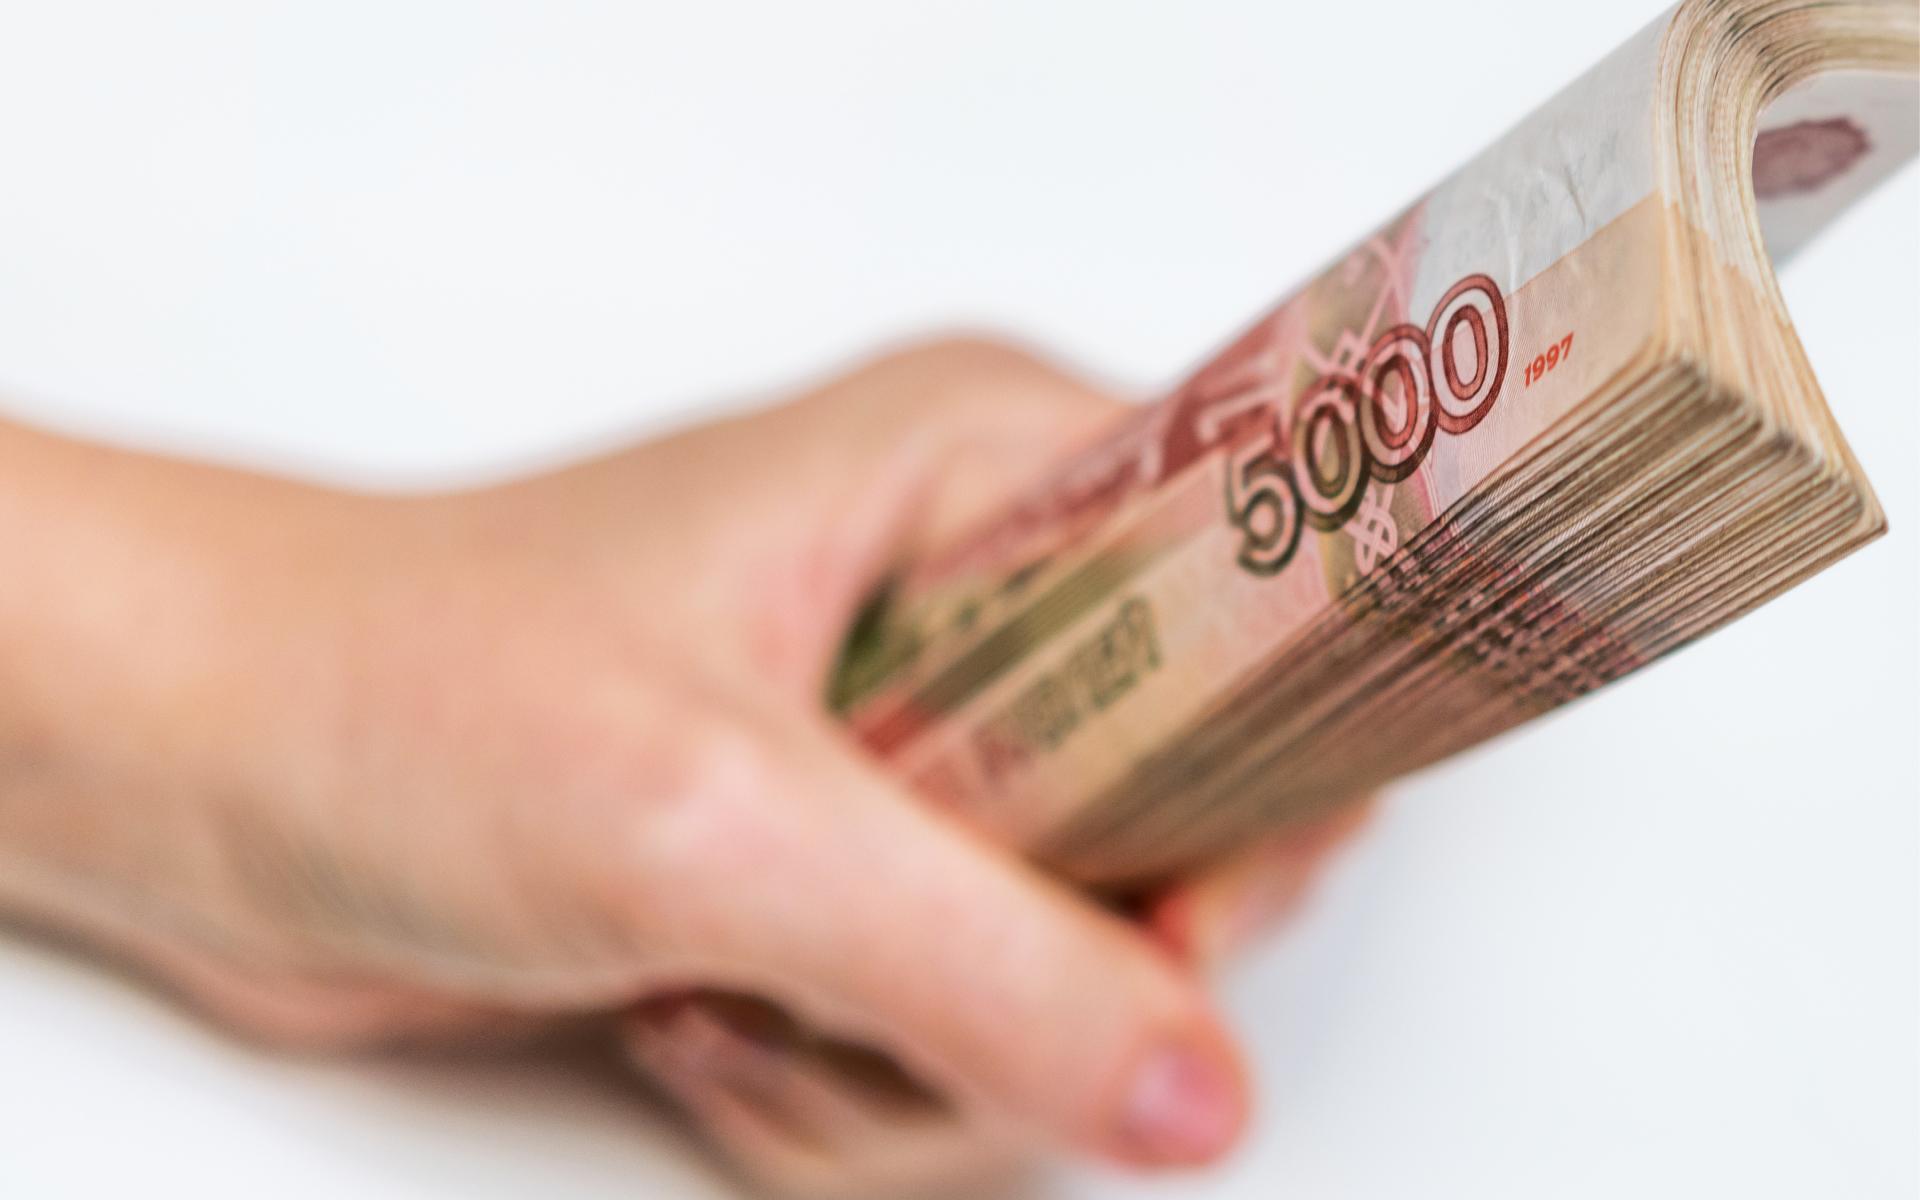 Средняя сумма ипотечного кредита в июле уменьшилась на 2,4%